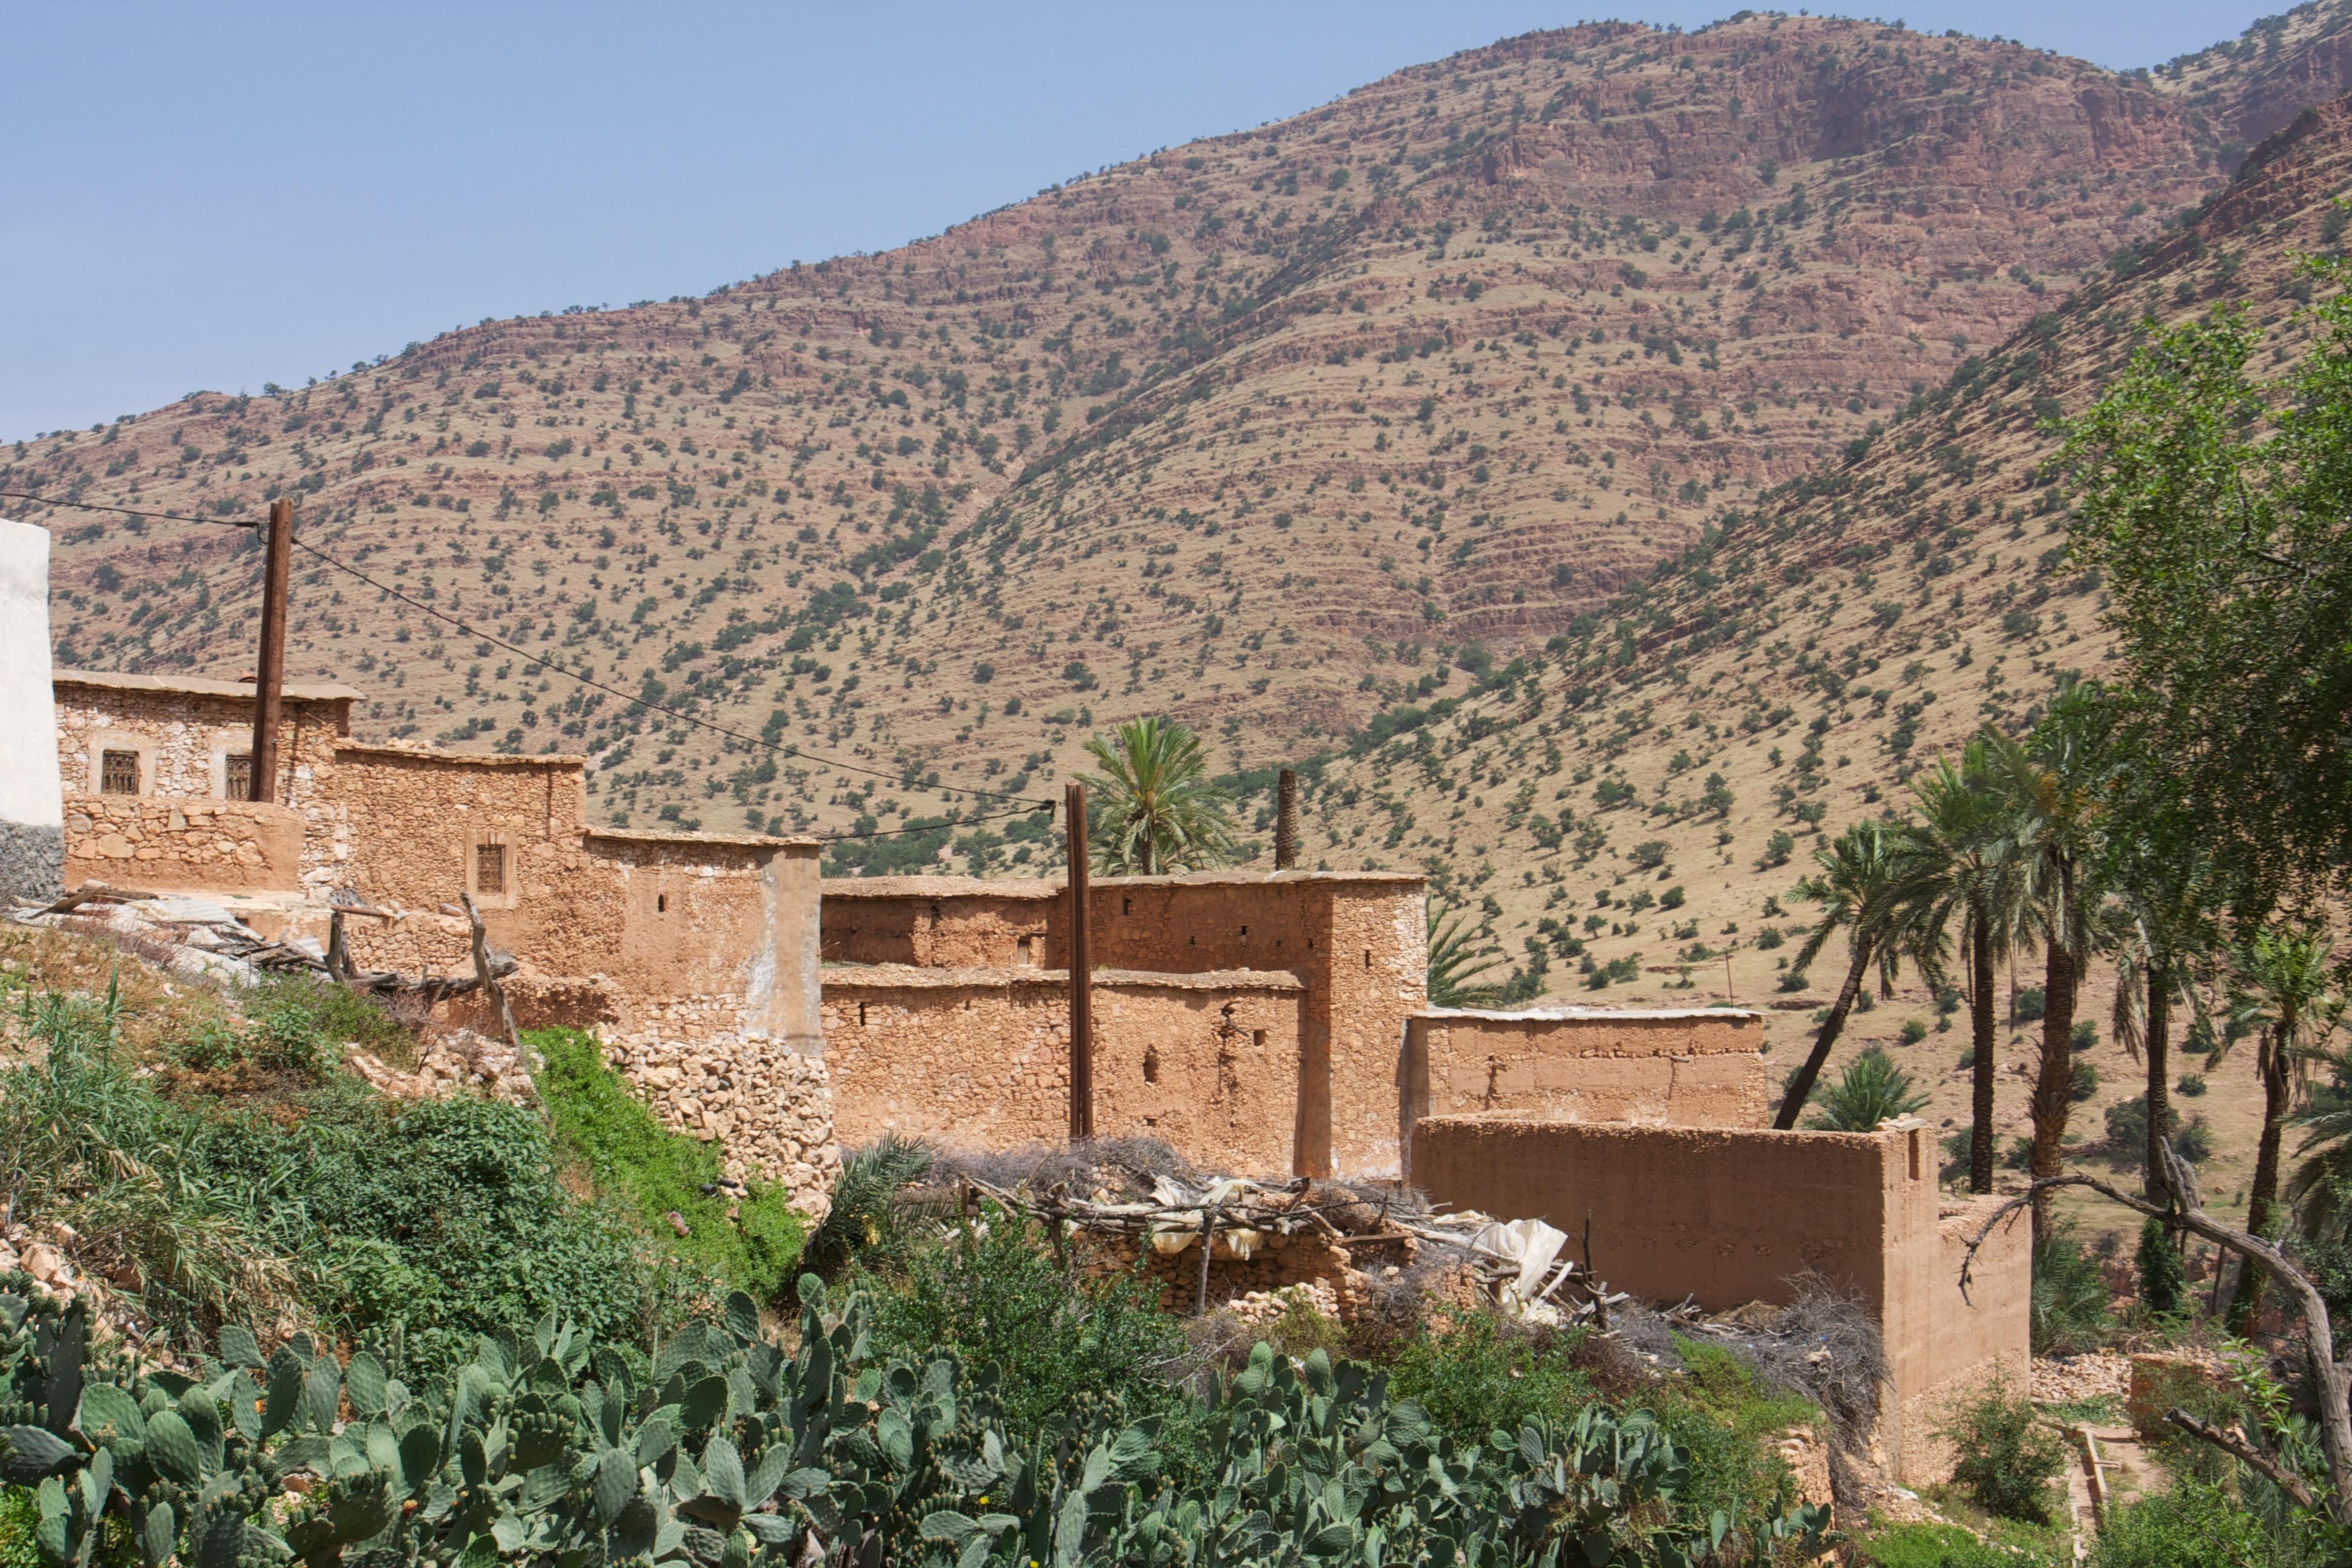 morocco-taroudant-village1532101743